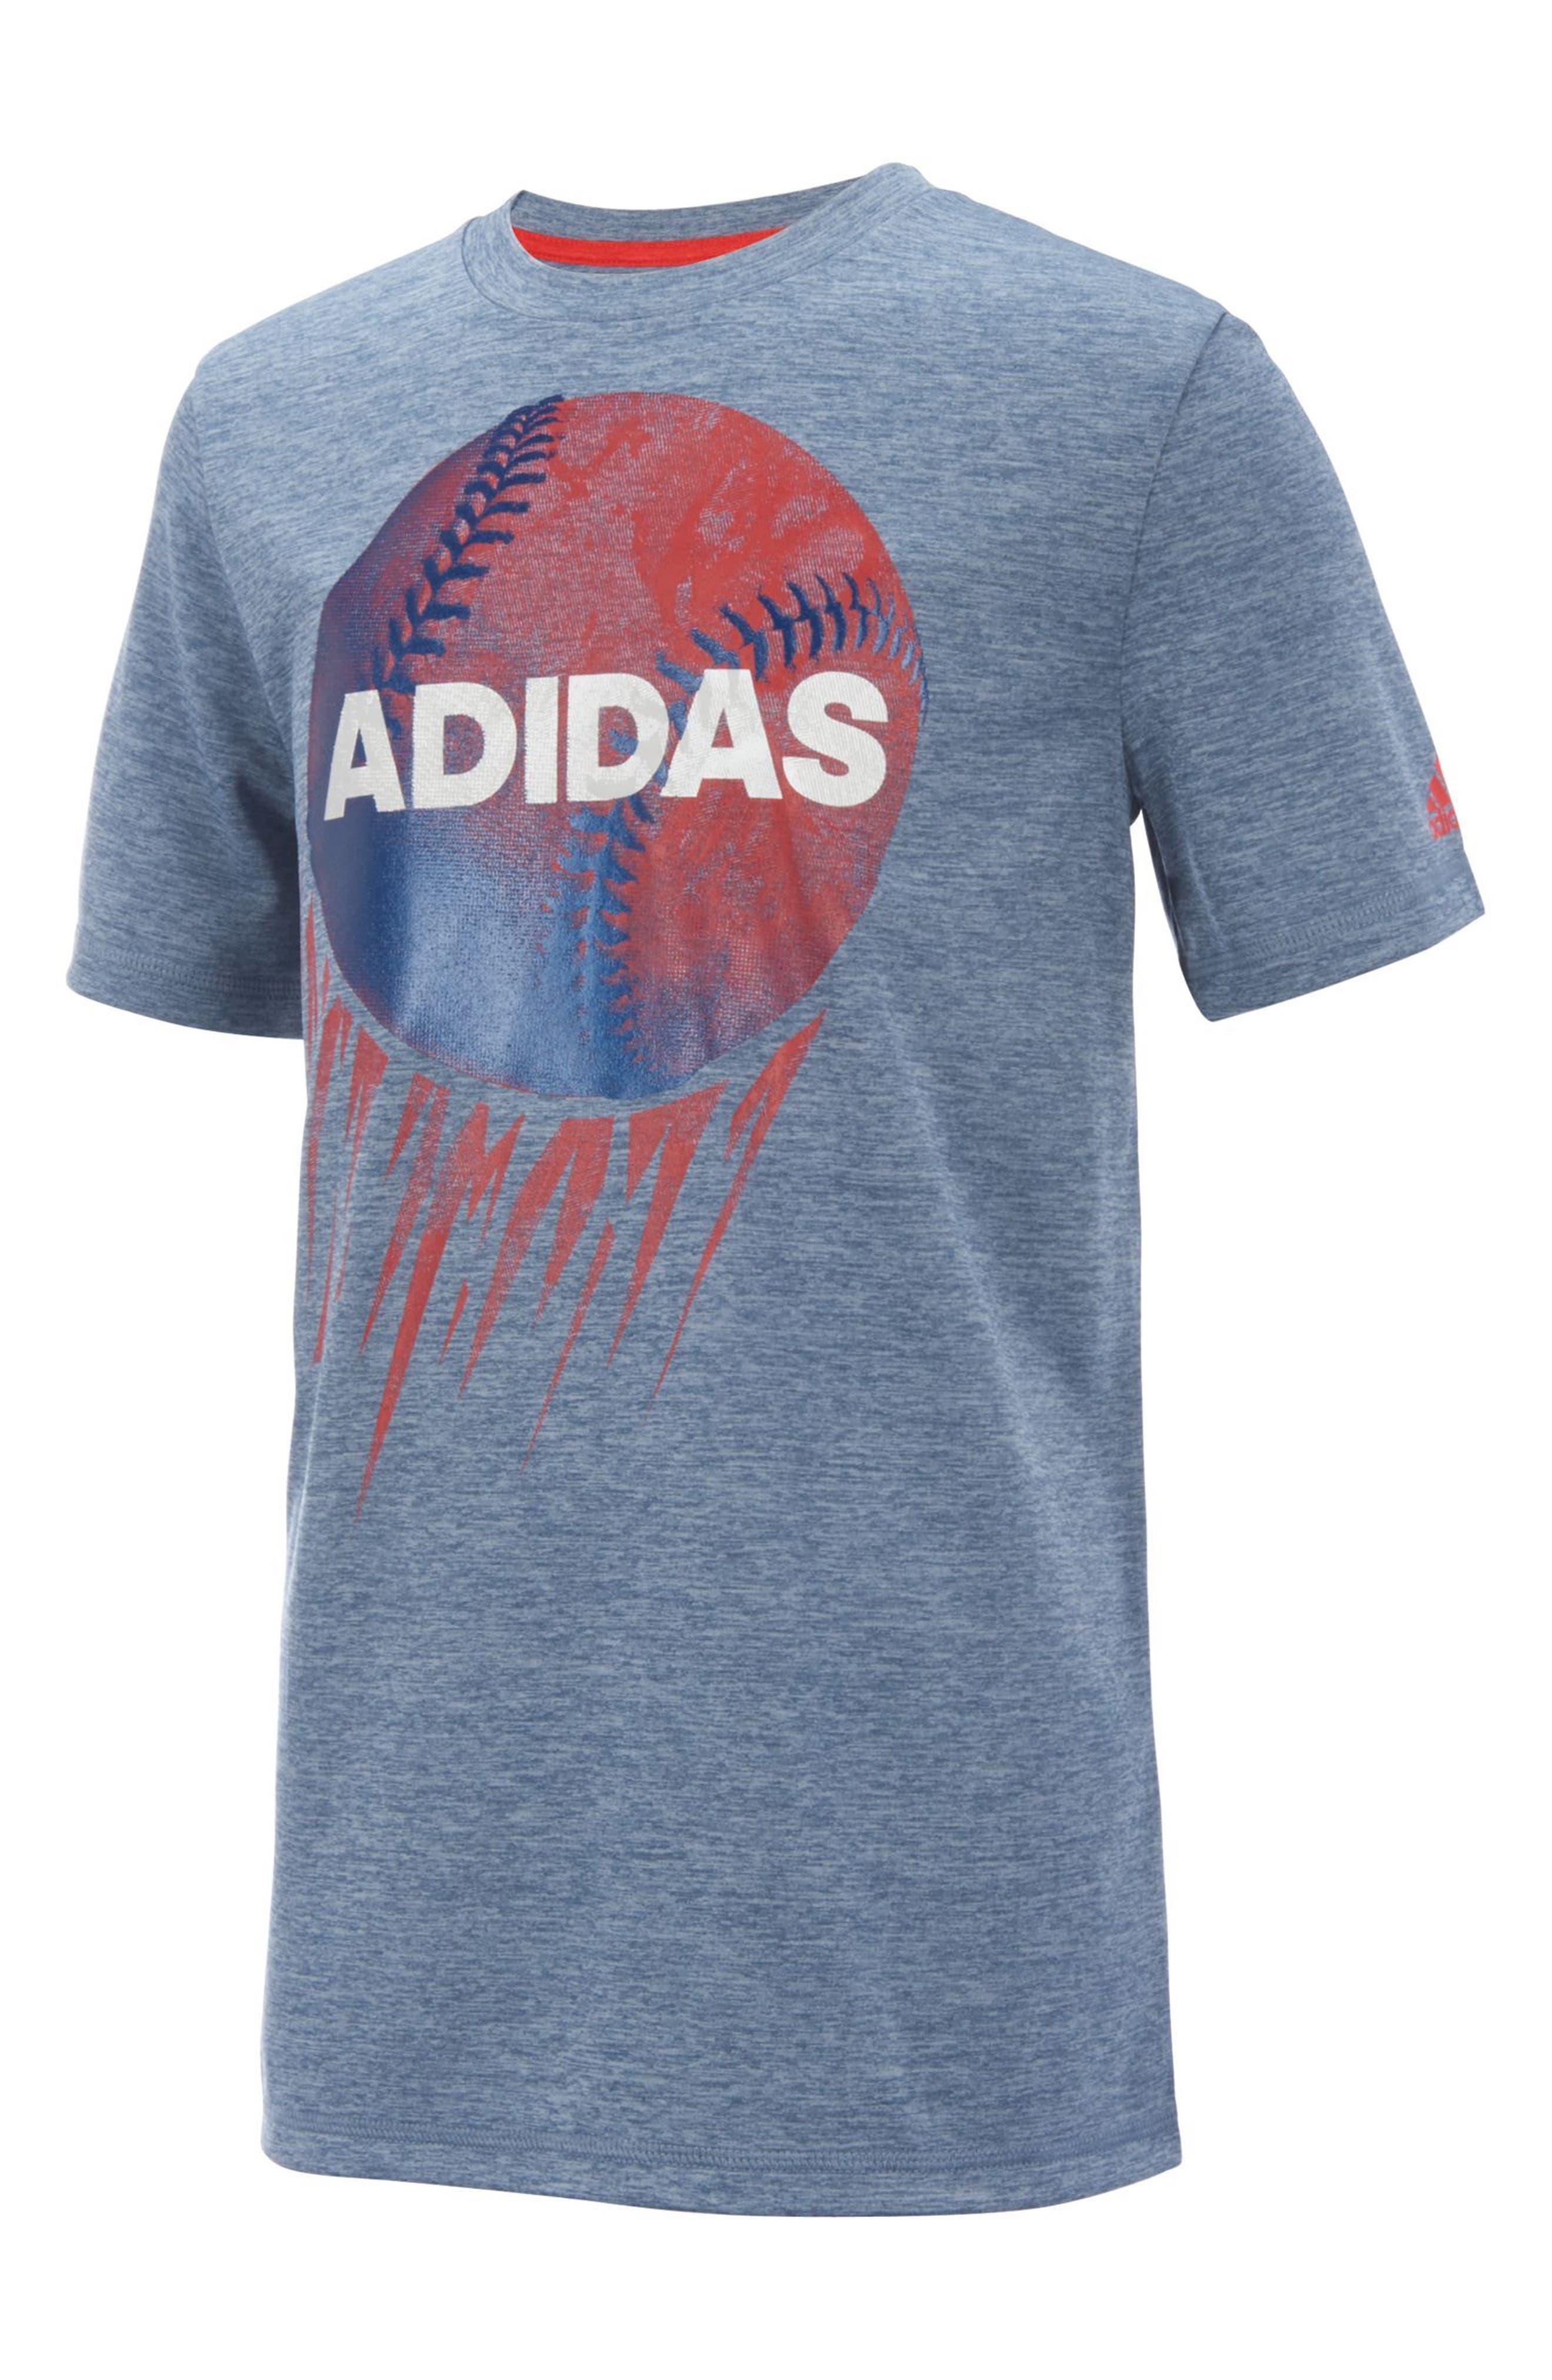 adidas Rocket Ball T-Shirt (Big Boys)